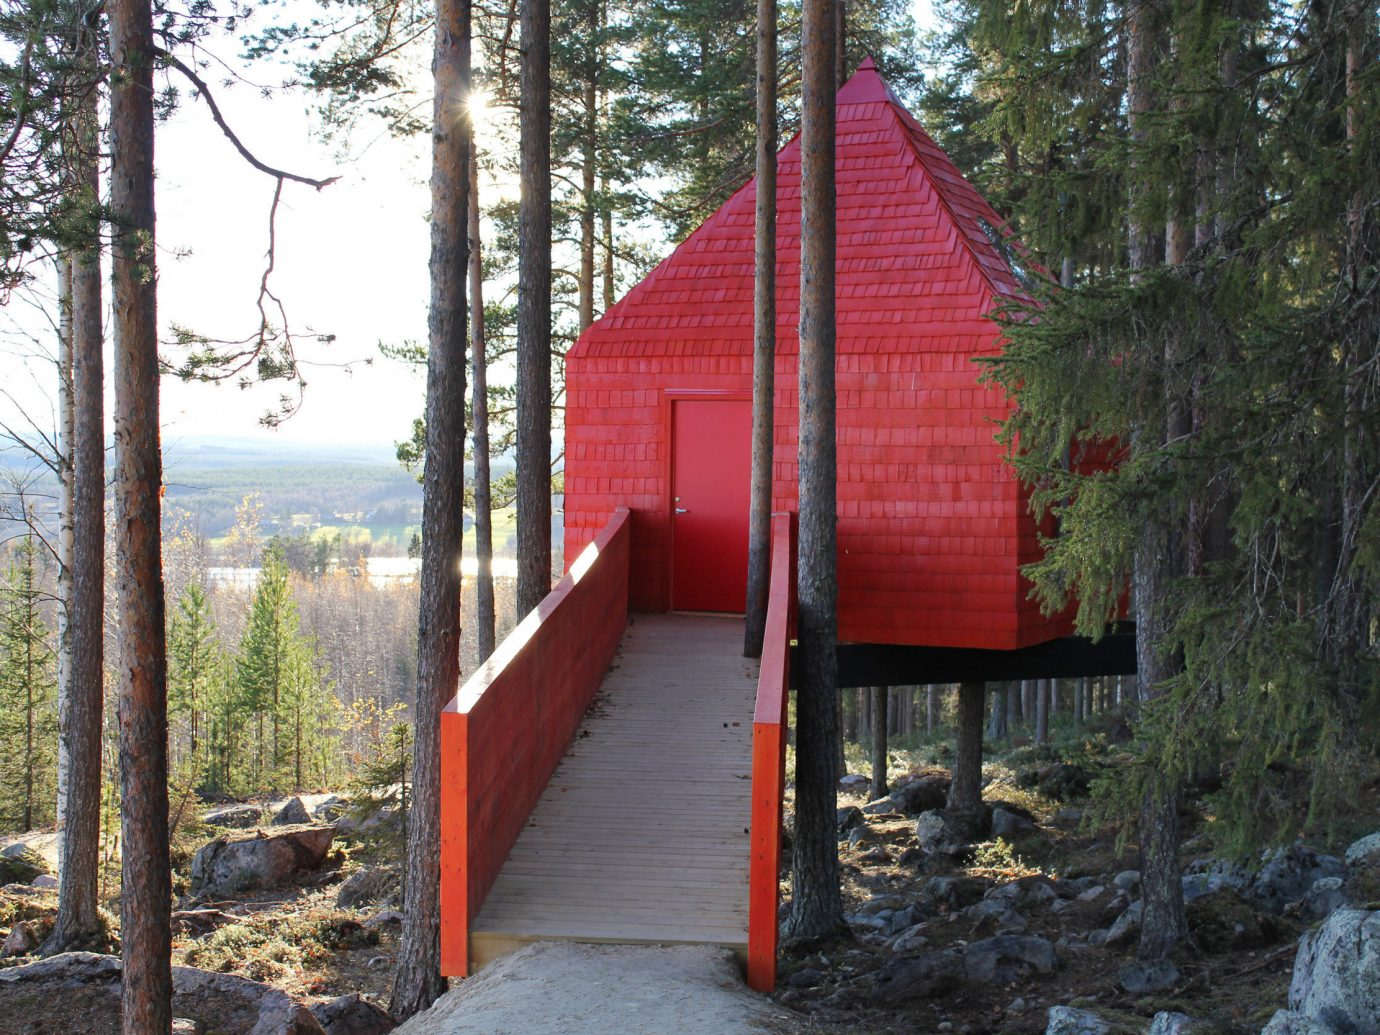 Hotels tree outdoor house shrine shinto shrine hut chapel cottage shack Forest wood wooded